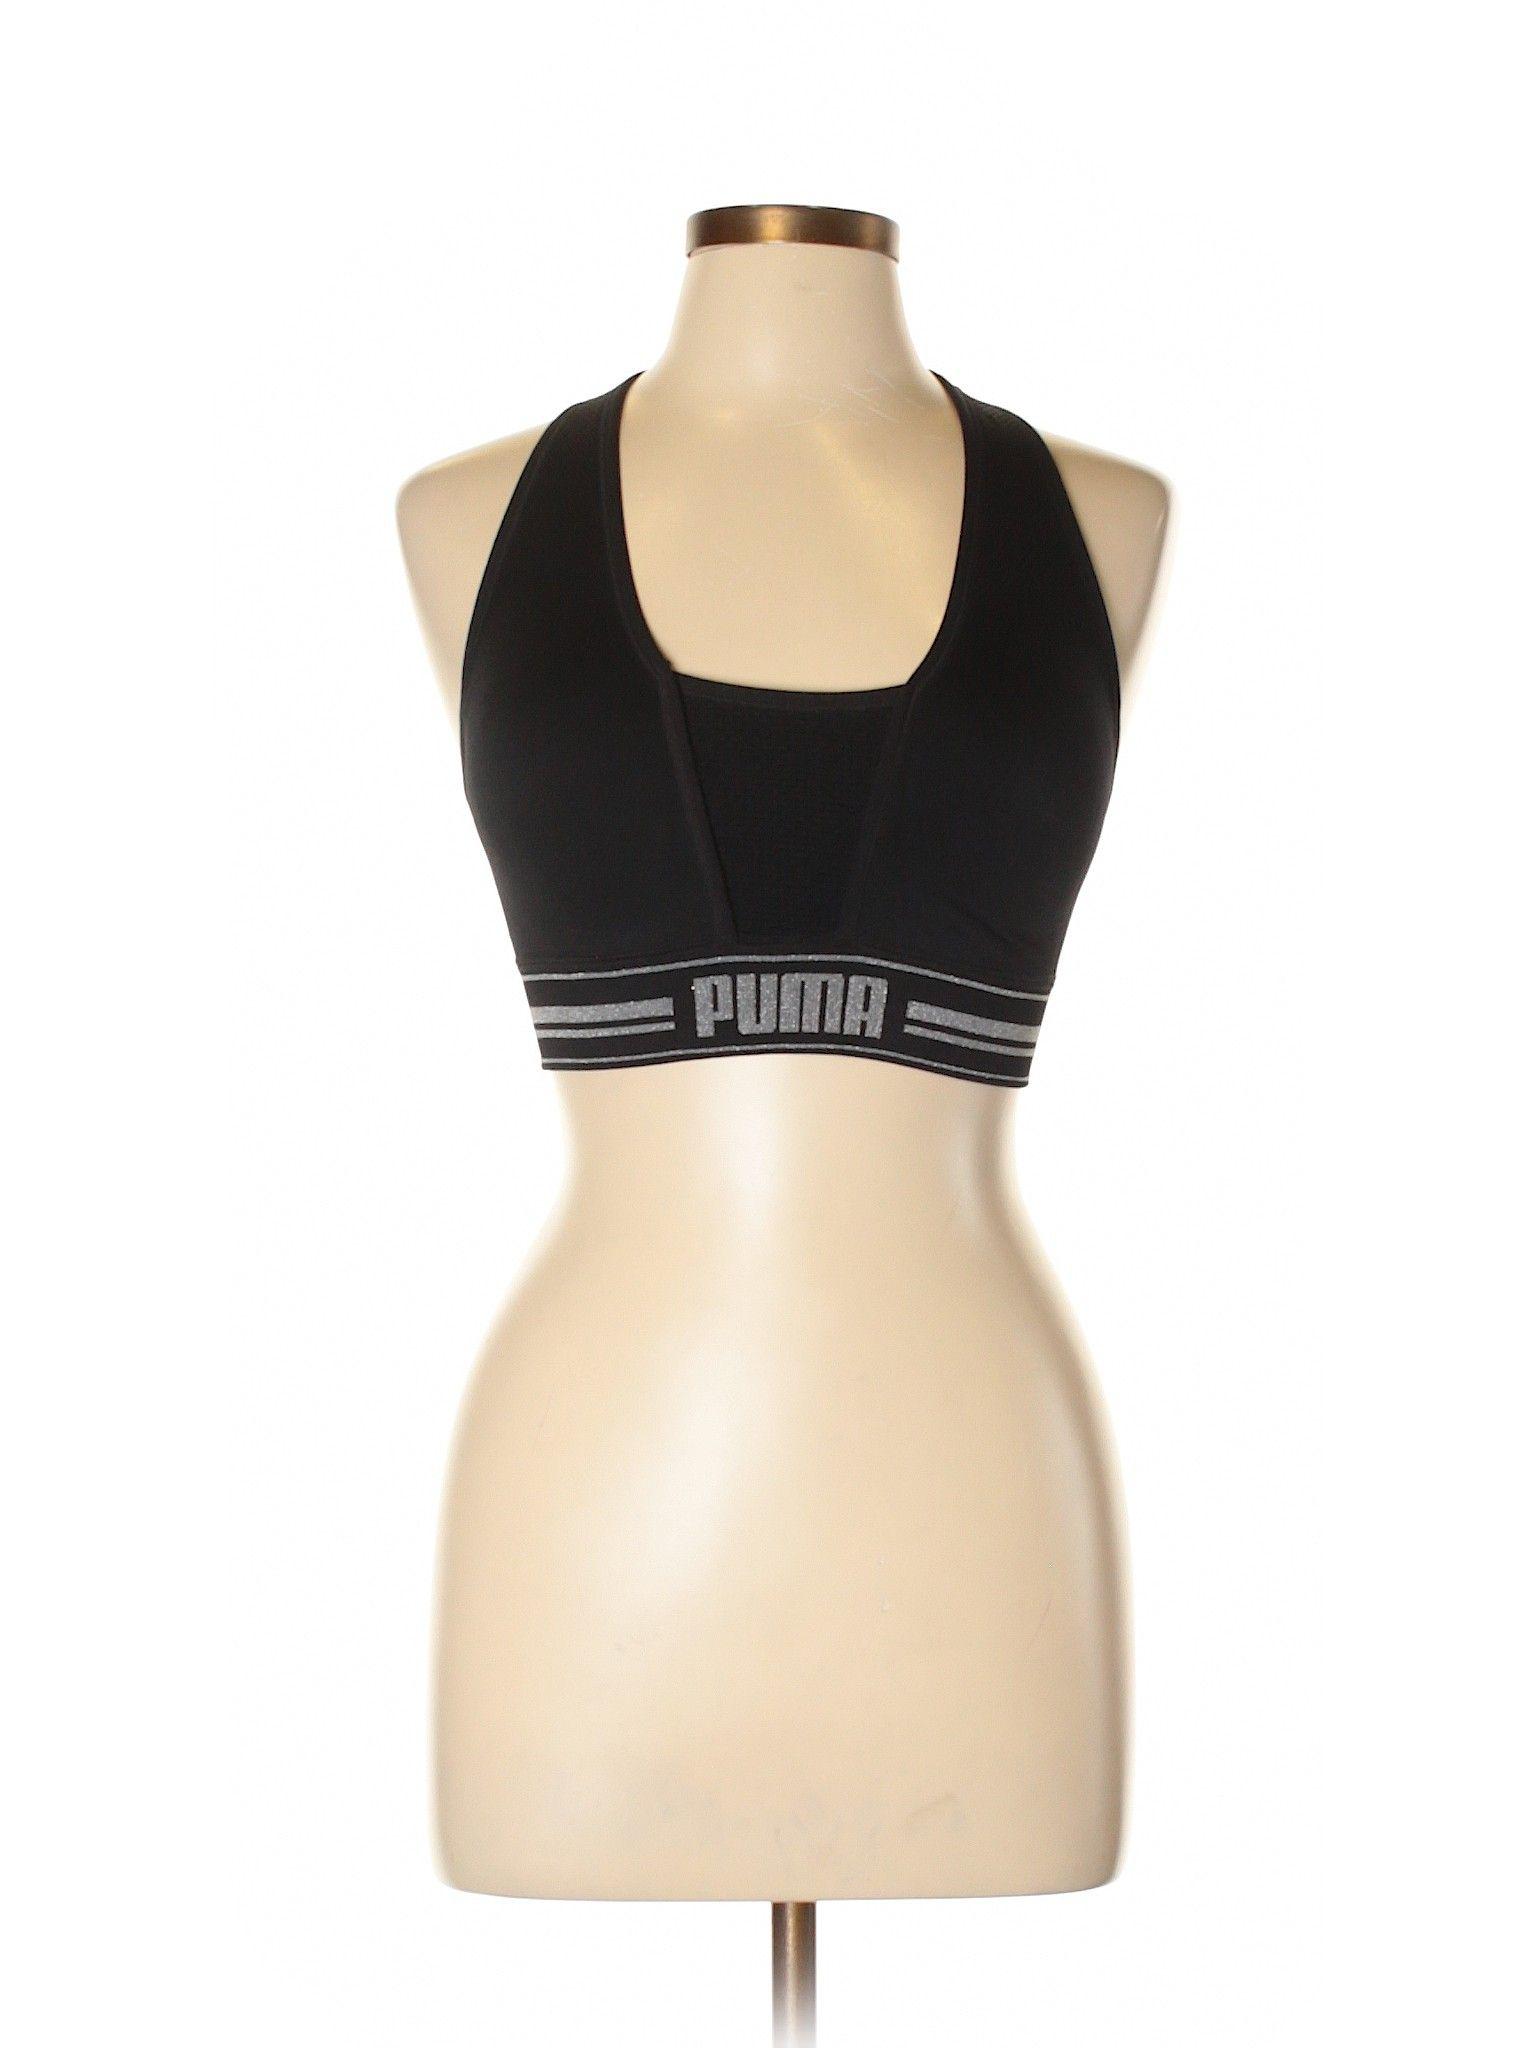 Sports Bra Active wear for women, Puma sport, Sports bra